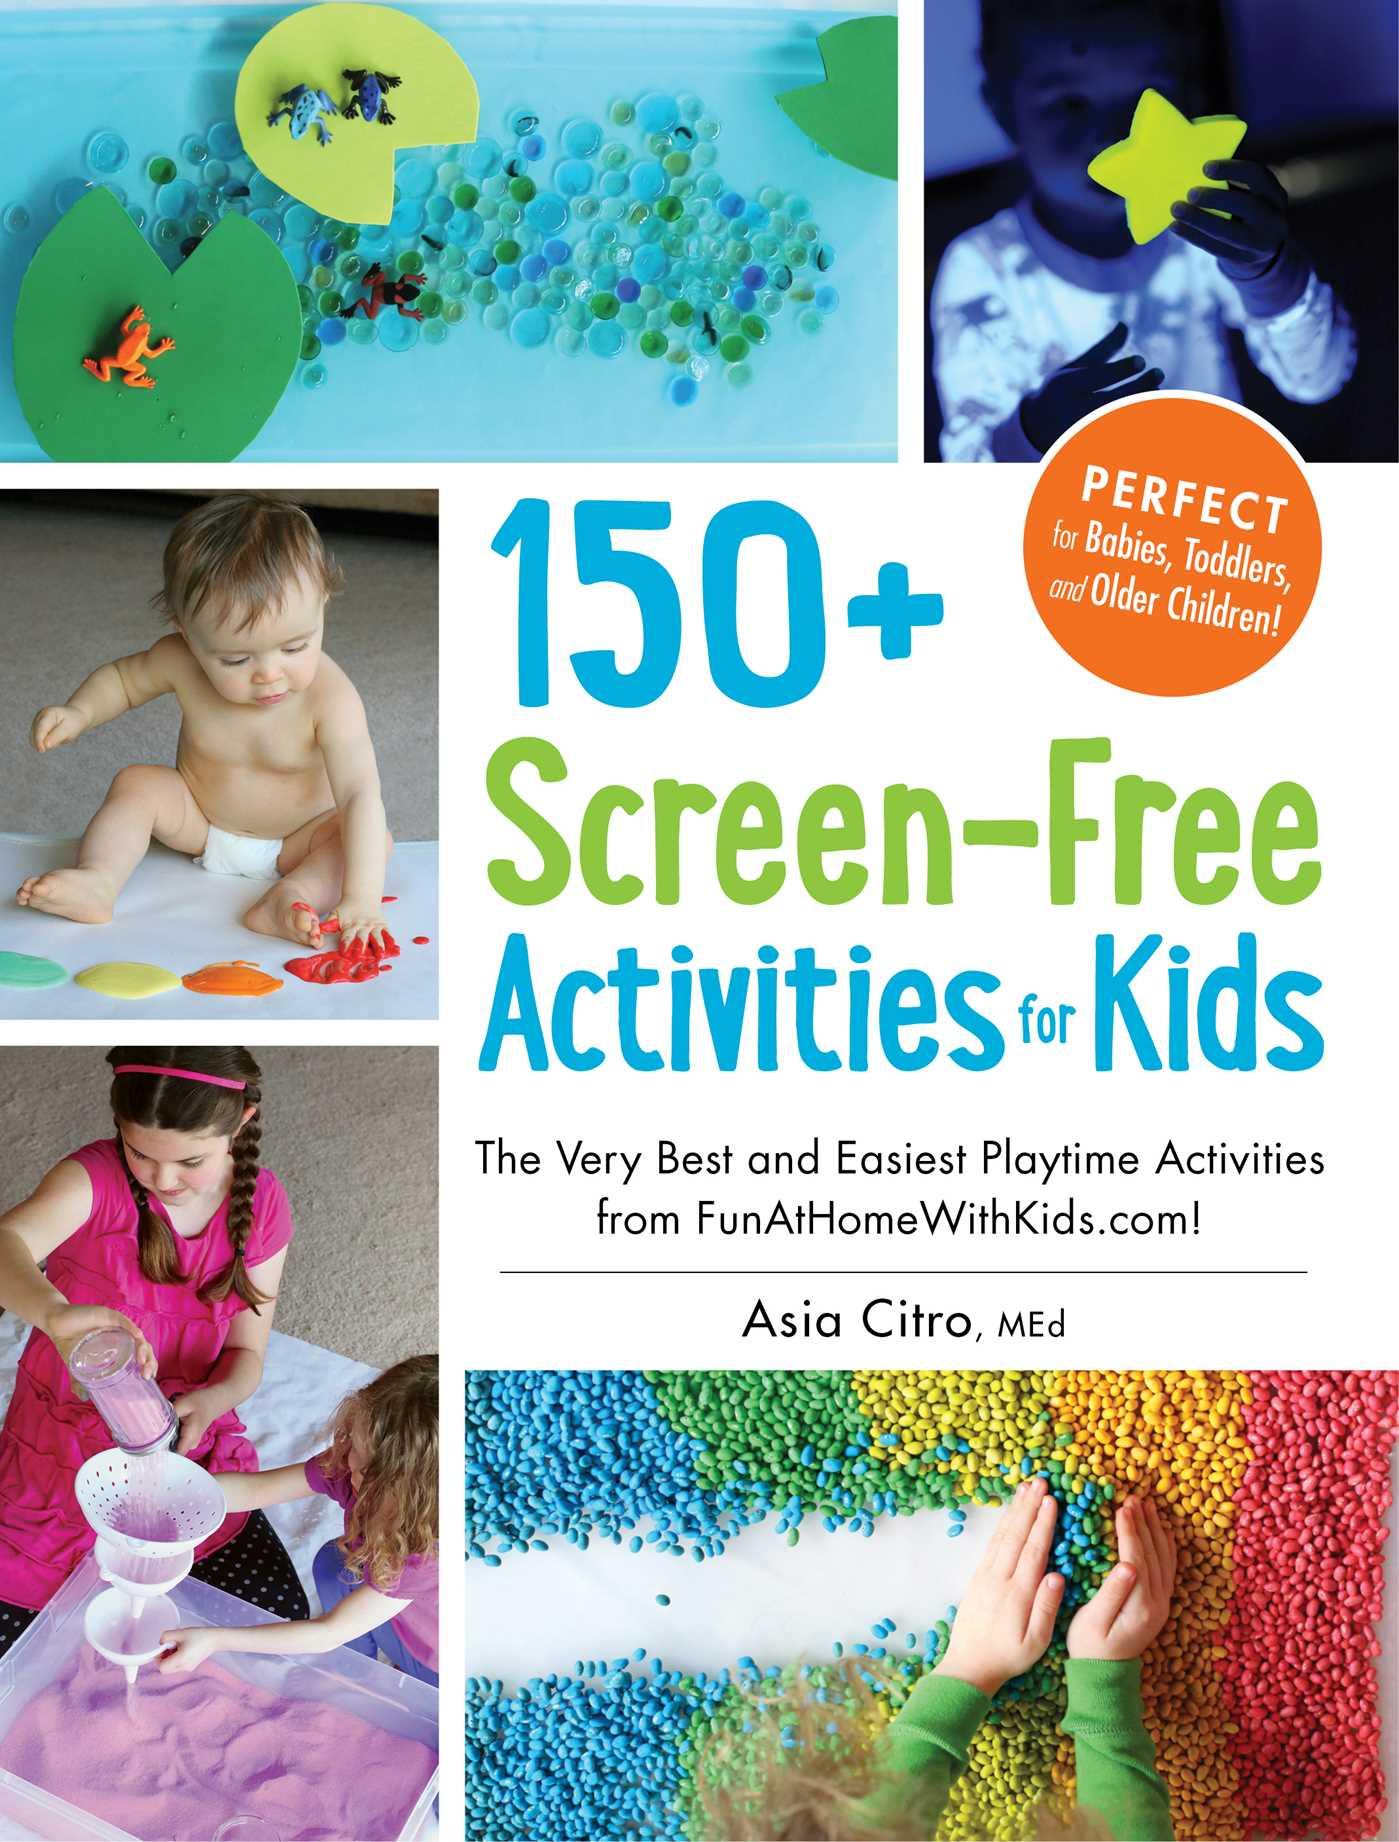 150 screen free activities for kids 9781440576157 hr